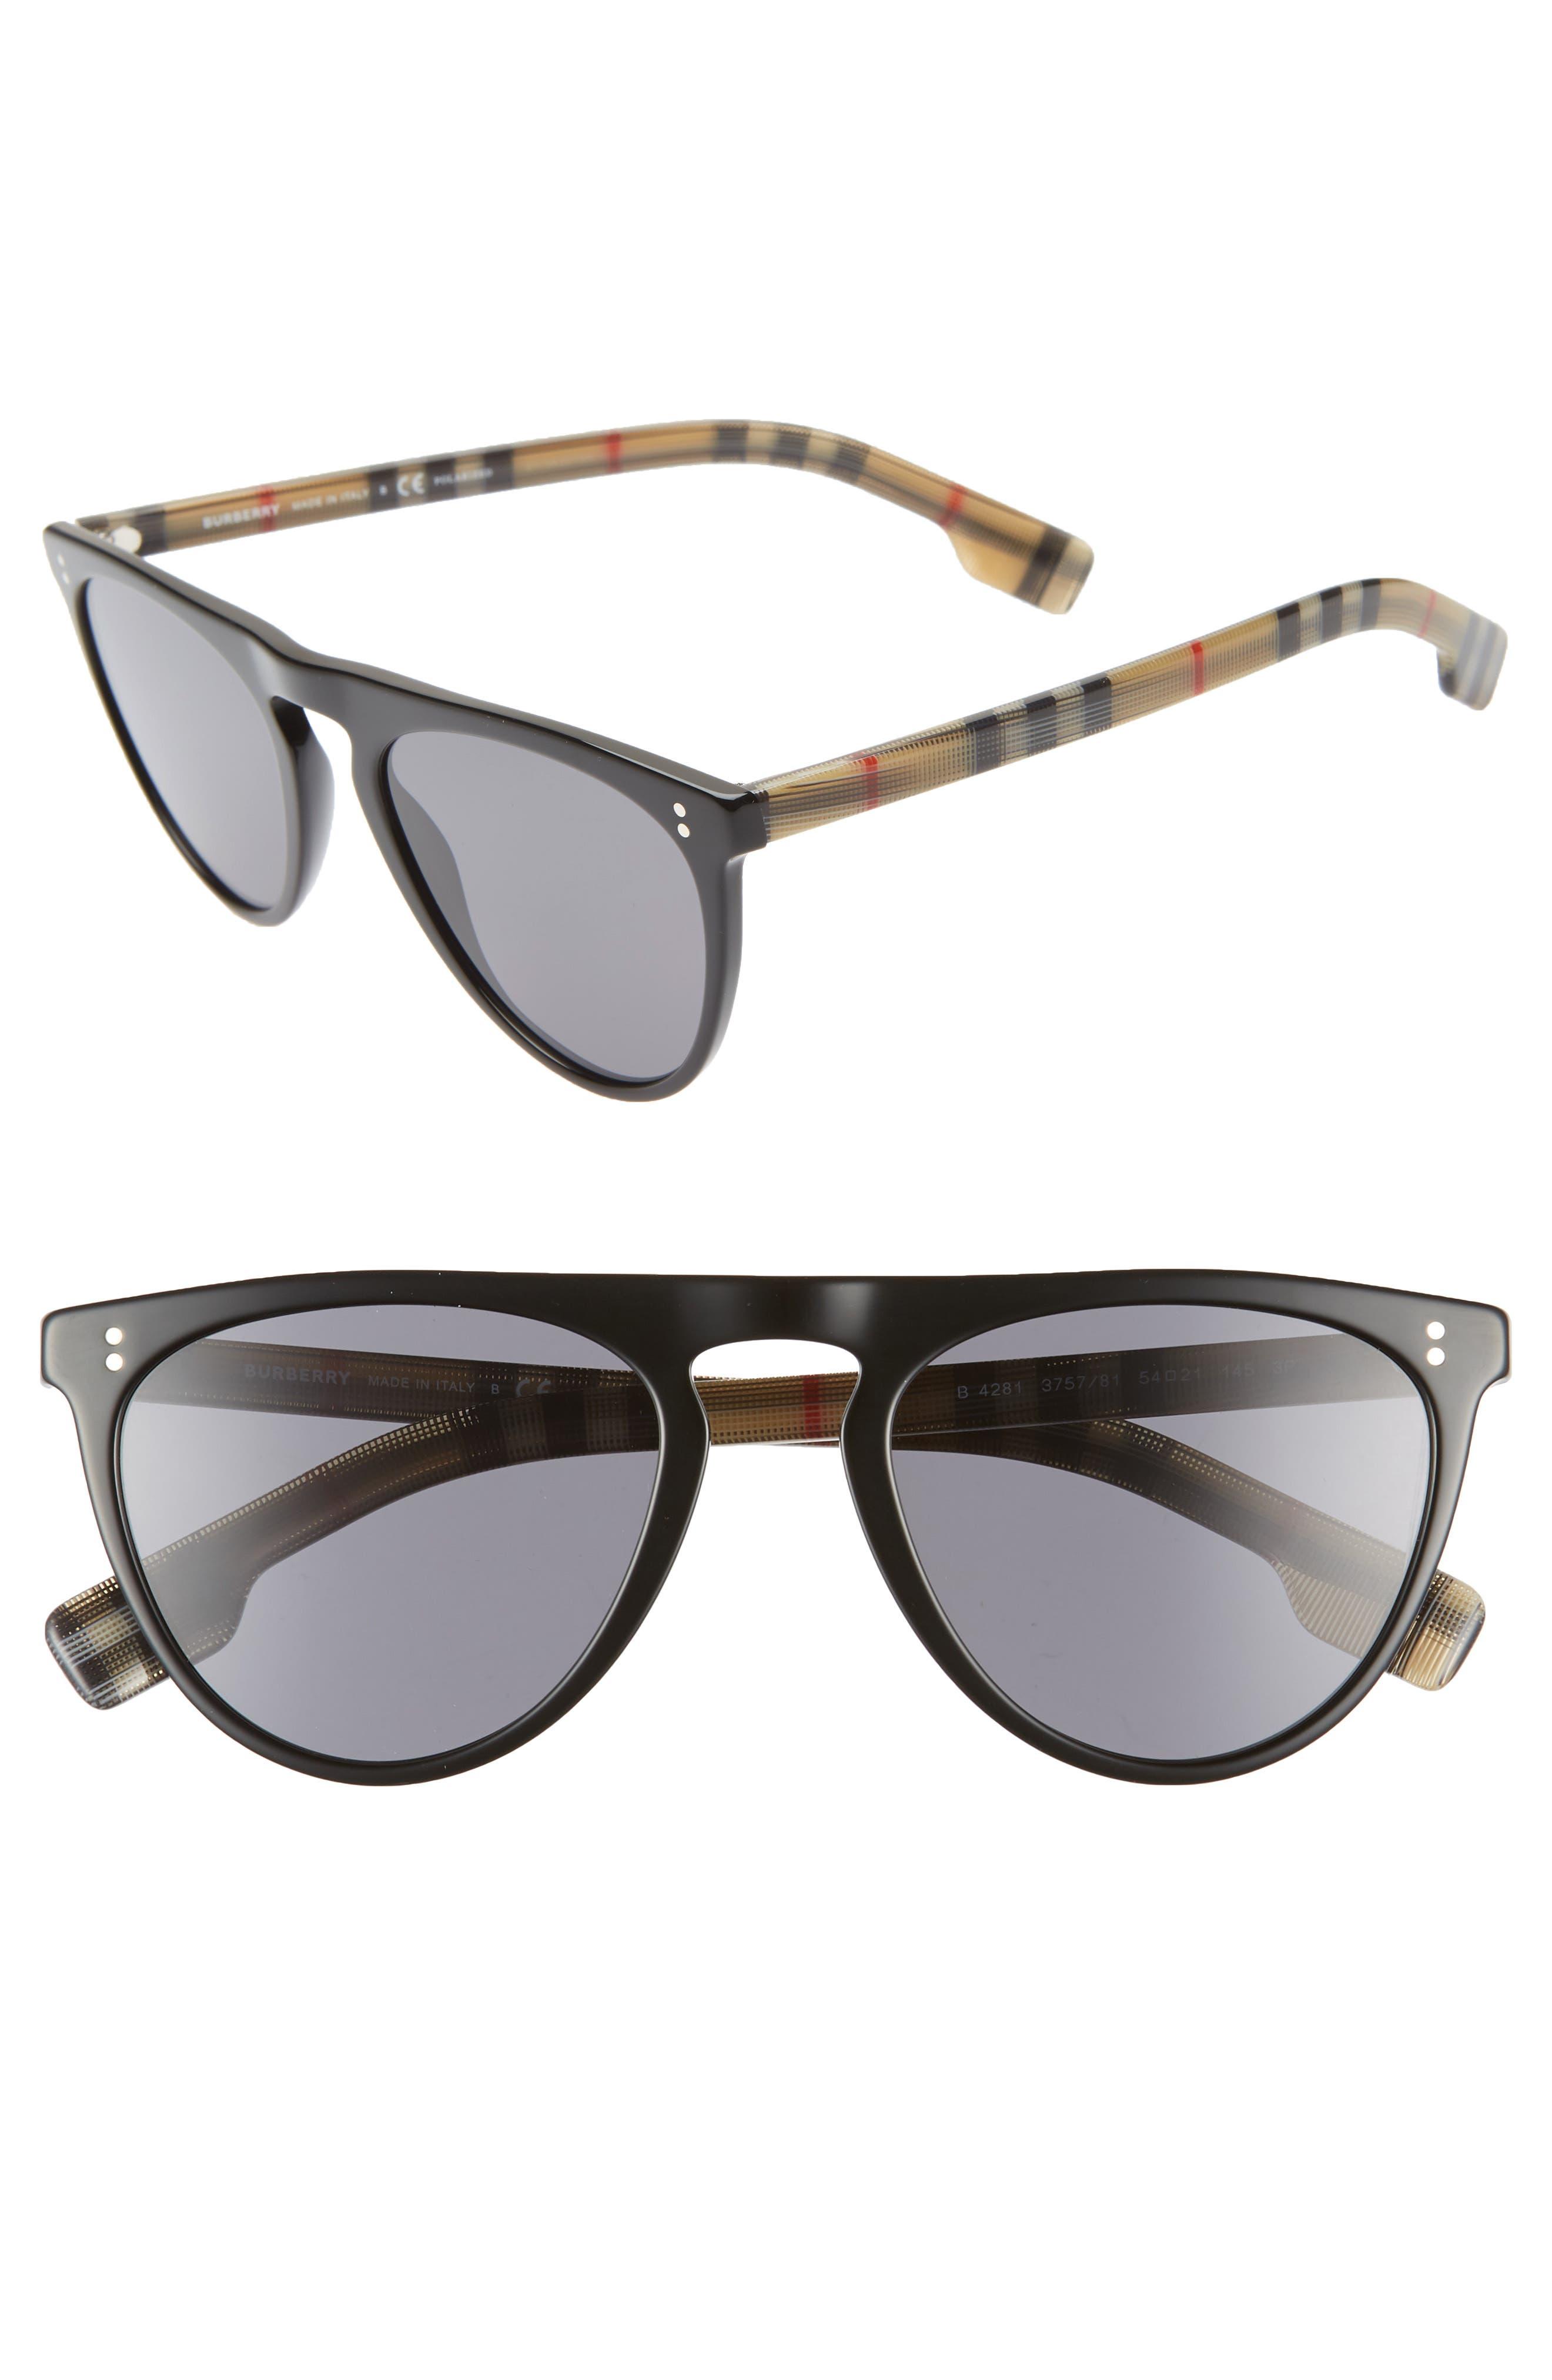 dab70f4a36 Buy burberry sunglasses   eyewear for women - Best women s burberry ...